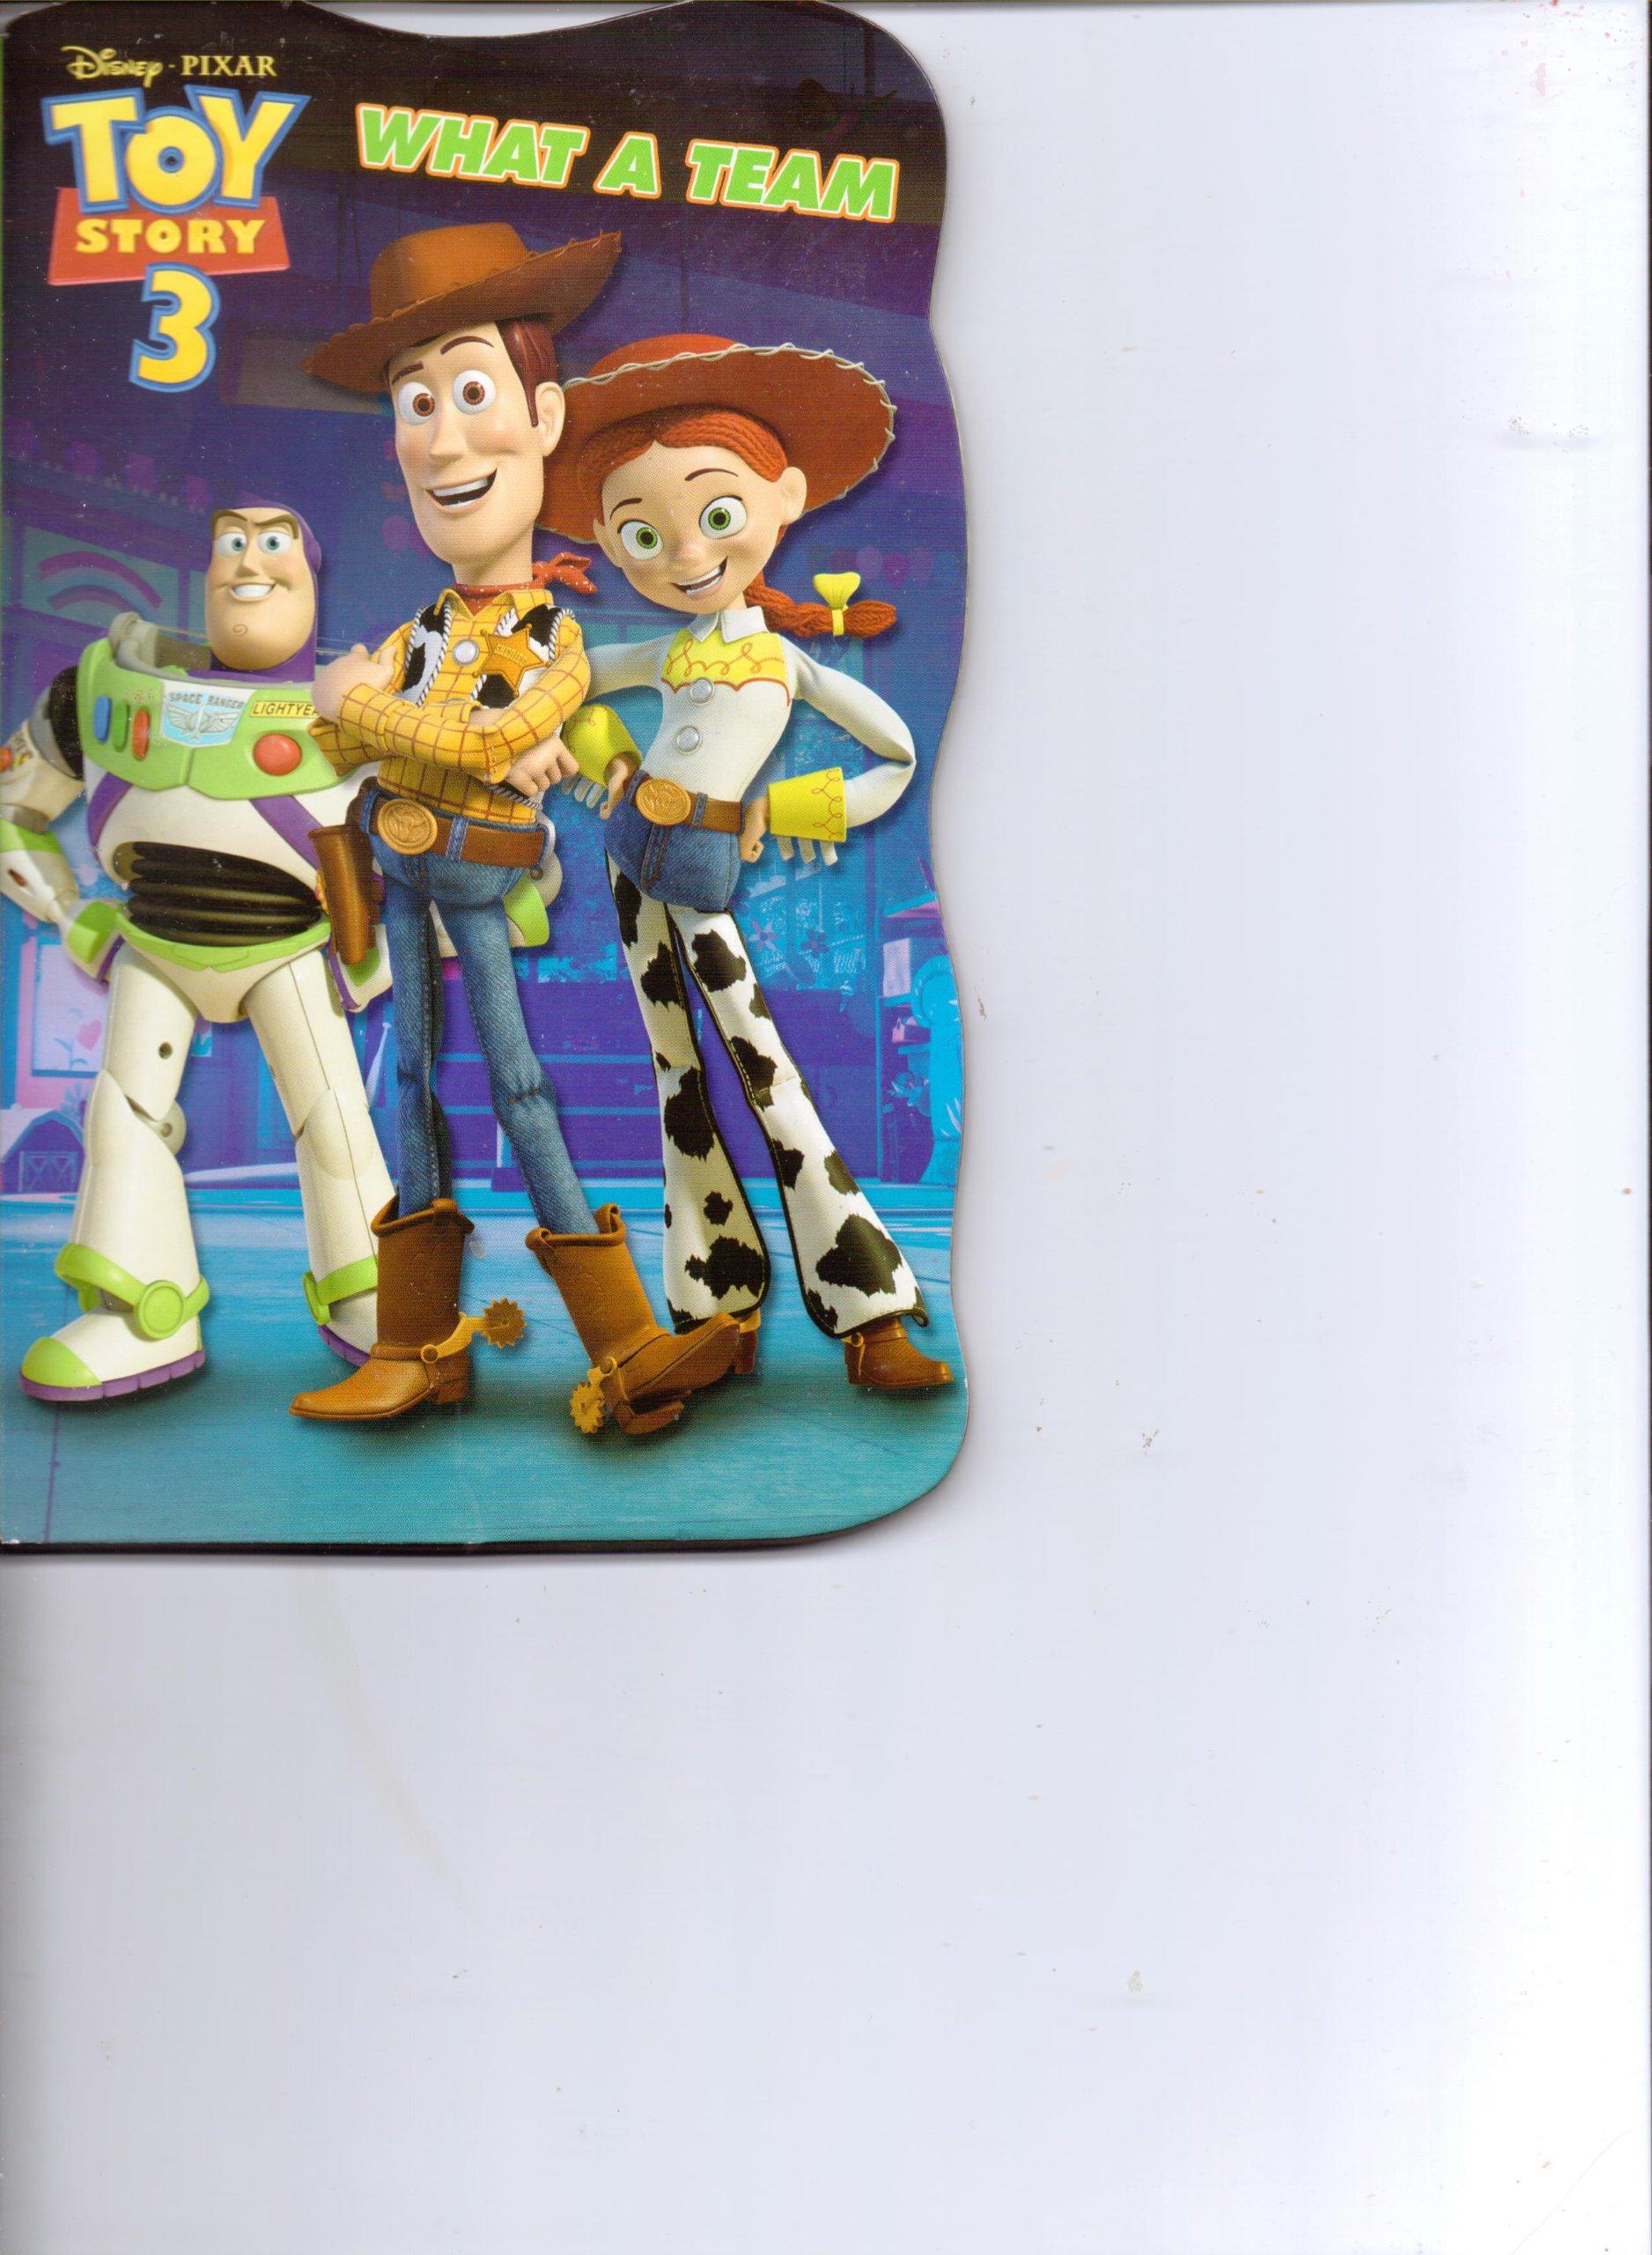 Download Disney*Pixar Toy Story 3 ~ What a Team ebook